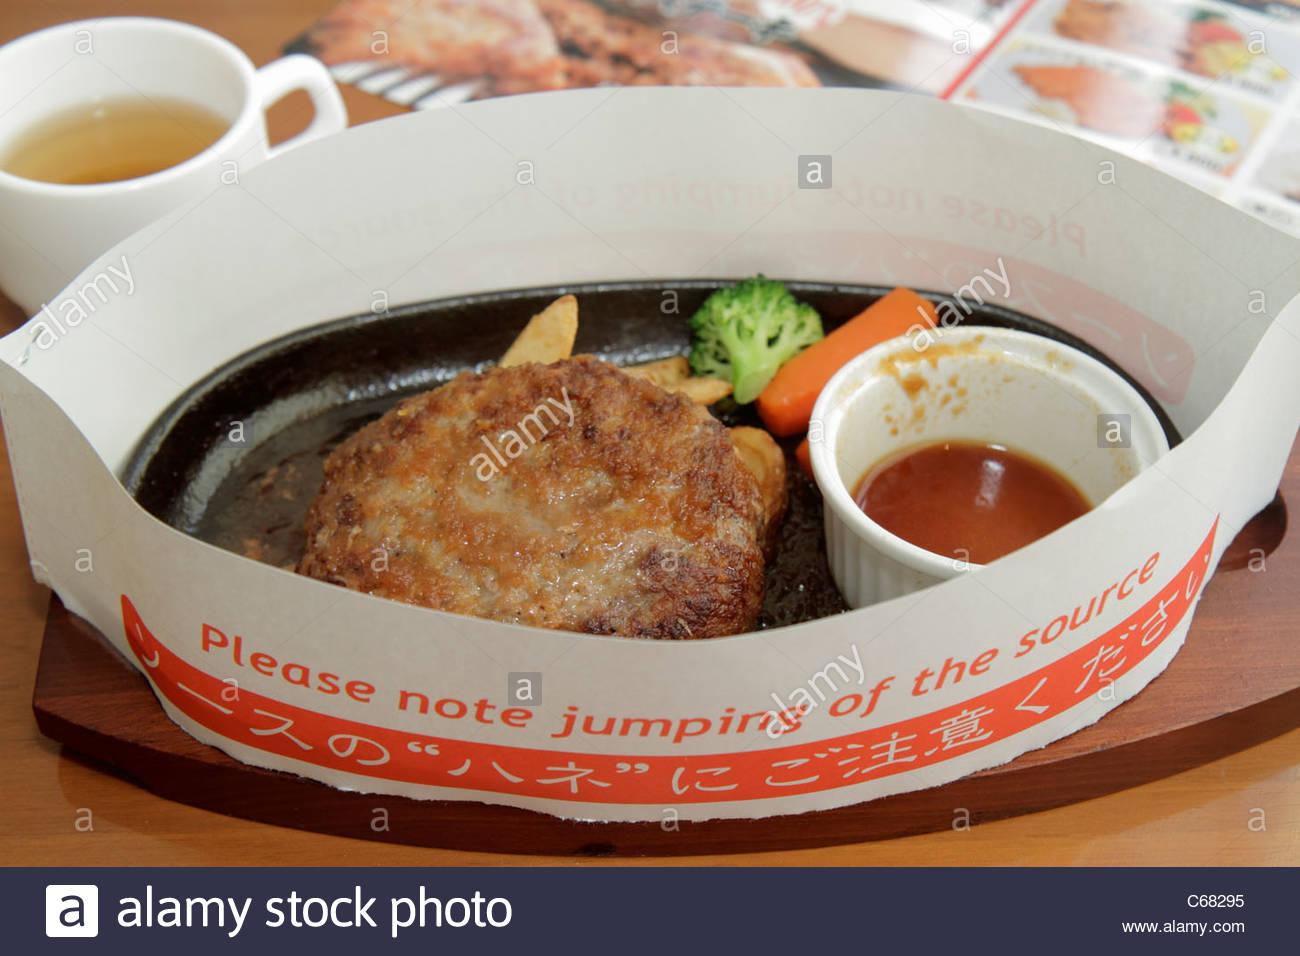 Tokyo japan akihabara restaurant kanji hiragana katakana tokyo japan akihabara restaurant kanji hiragana katakana characters symbols japanese english rough translation sizzling steak ve buycottarizona Images